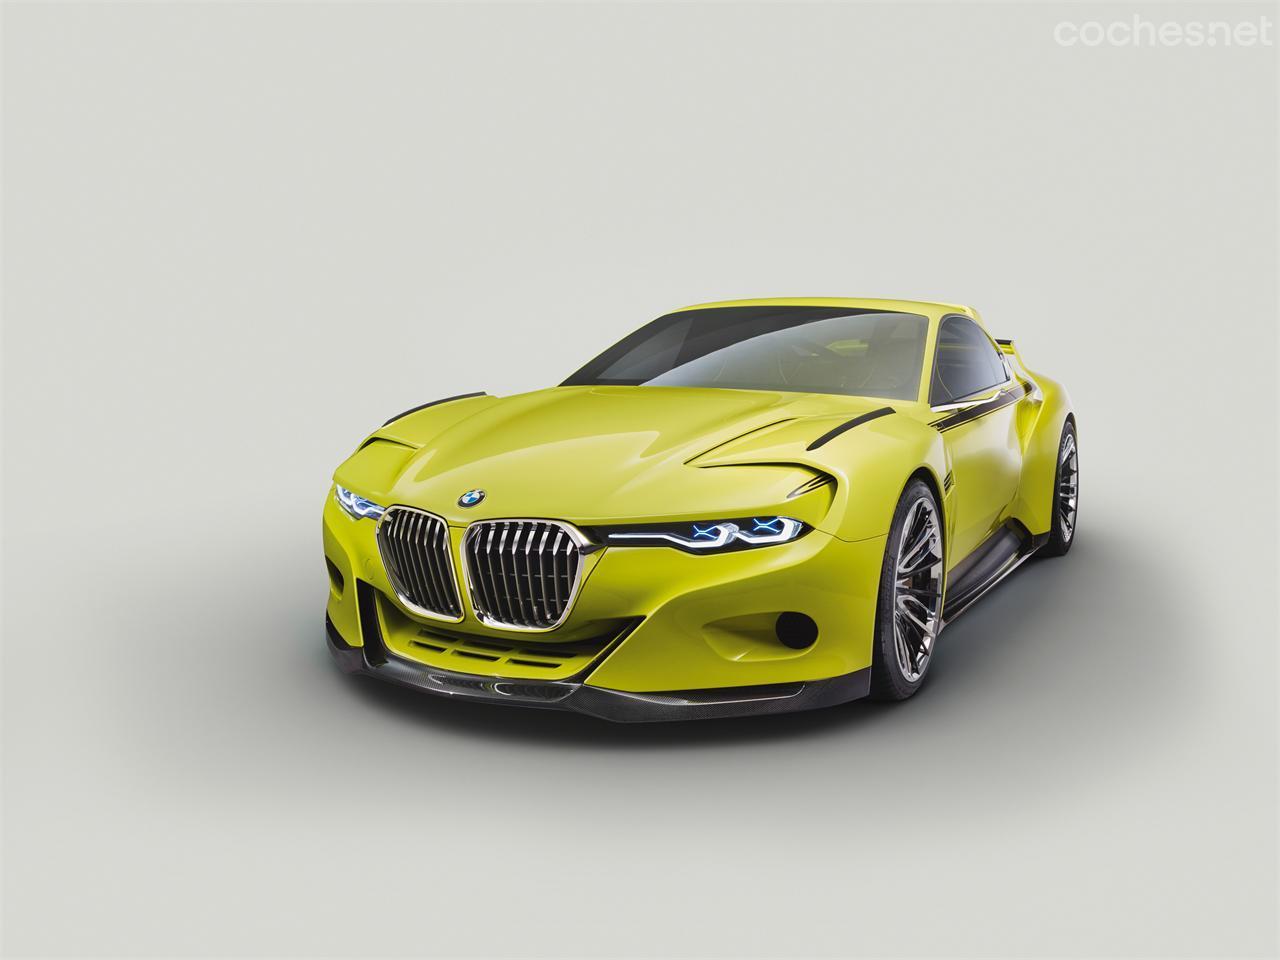 BMW 3.0 CSL Hommage Concept - foto 6